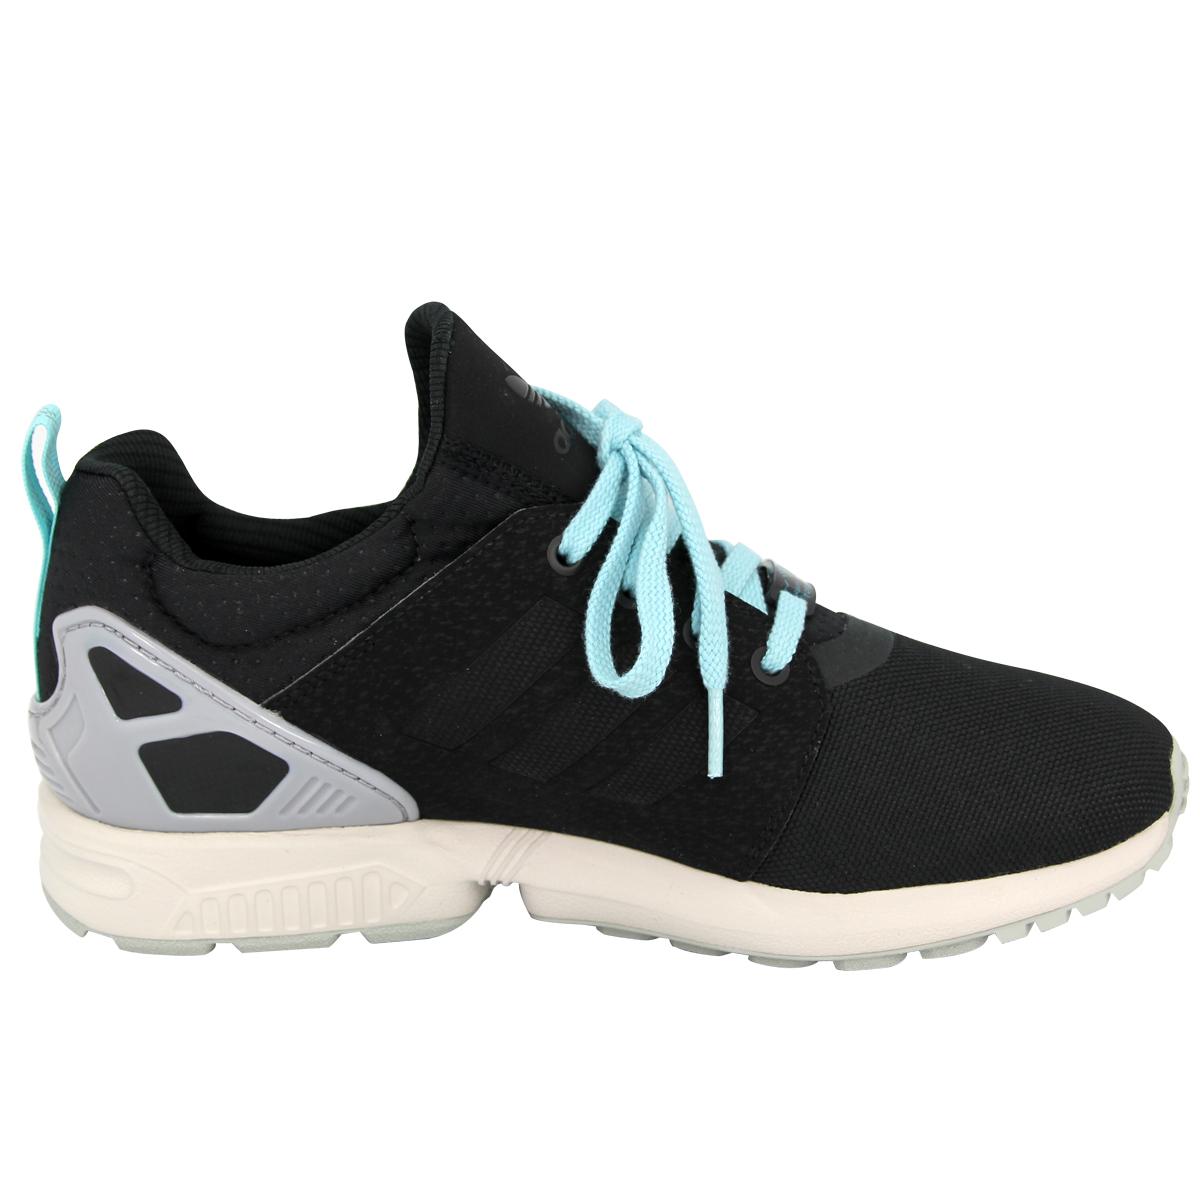 Homme Flux Mode Noir Sneakers Zx Originals Adidas Chaussures qCEwSEY